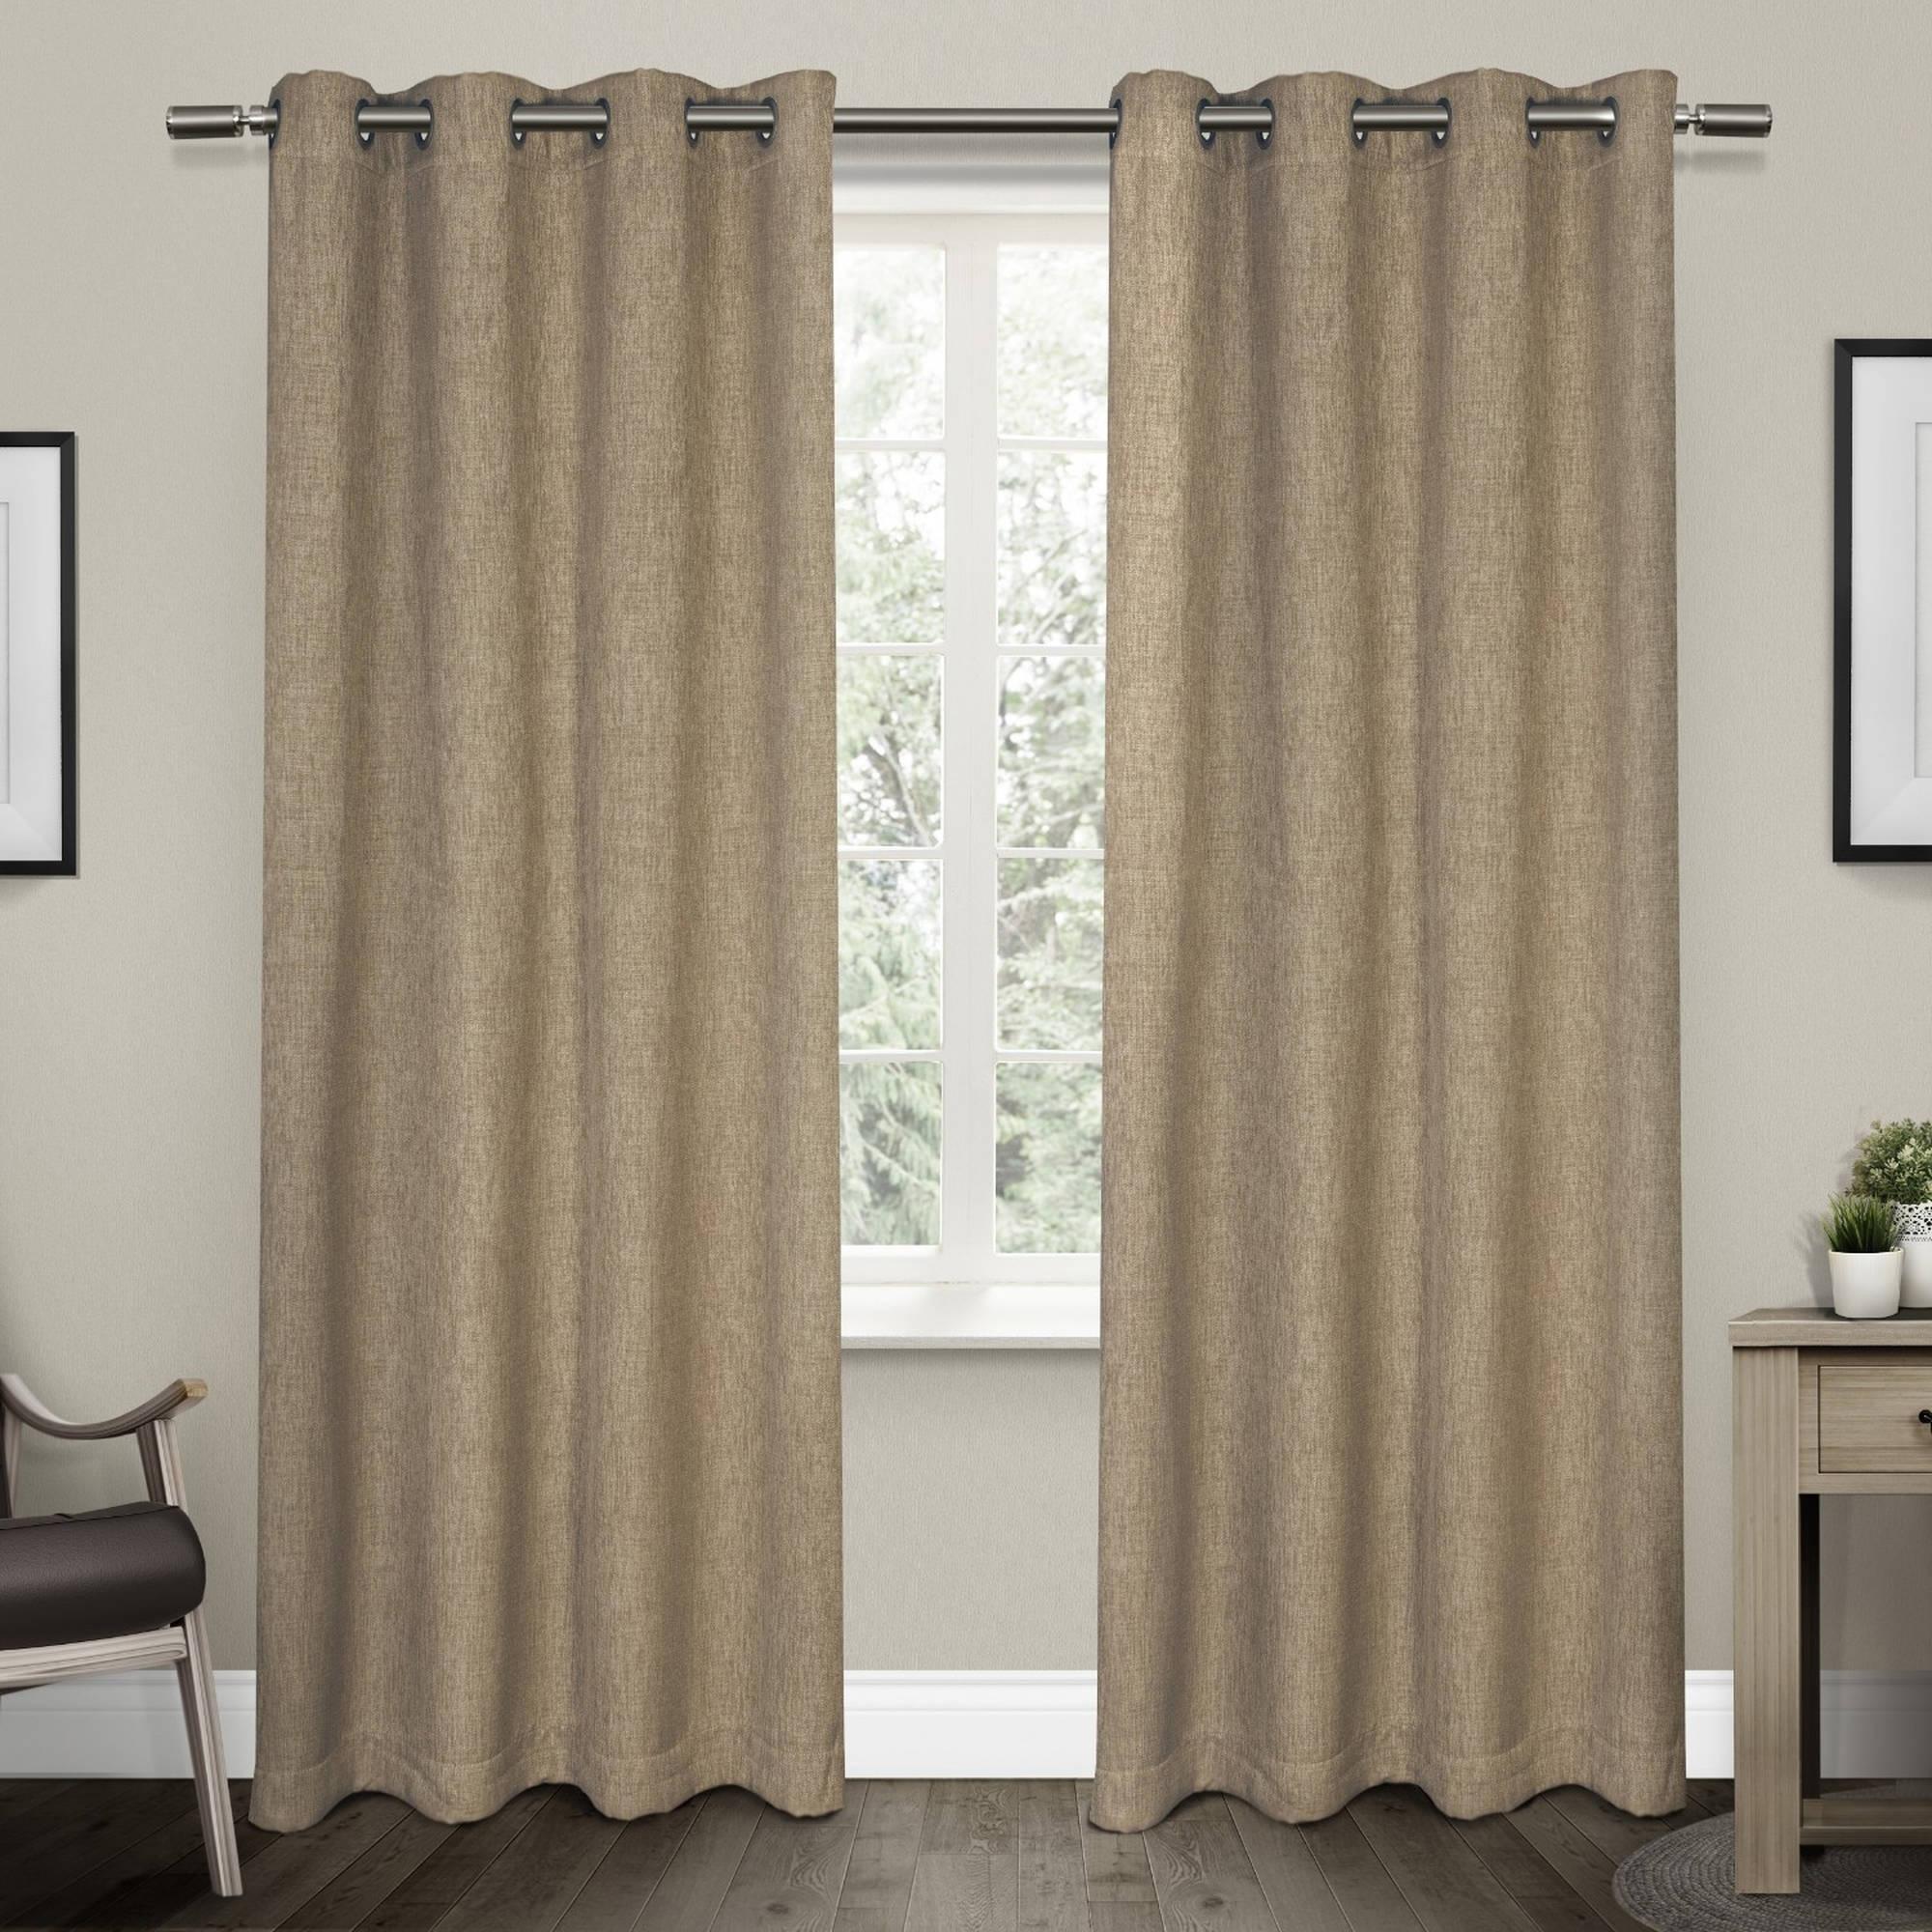 Linen Curtains Regarding Linen Grommet Curtains (Image 12 of 25)